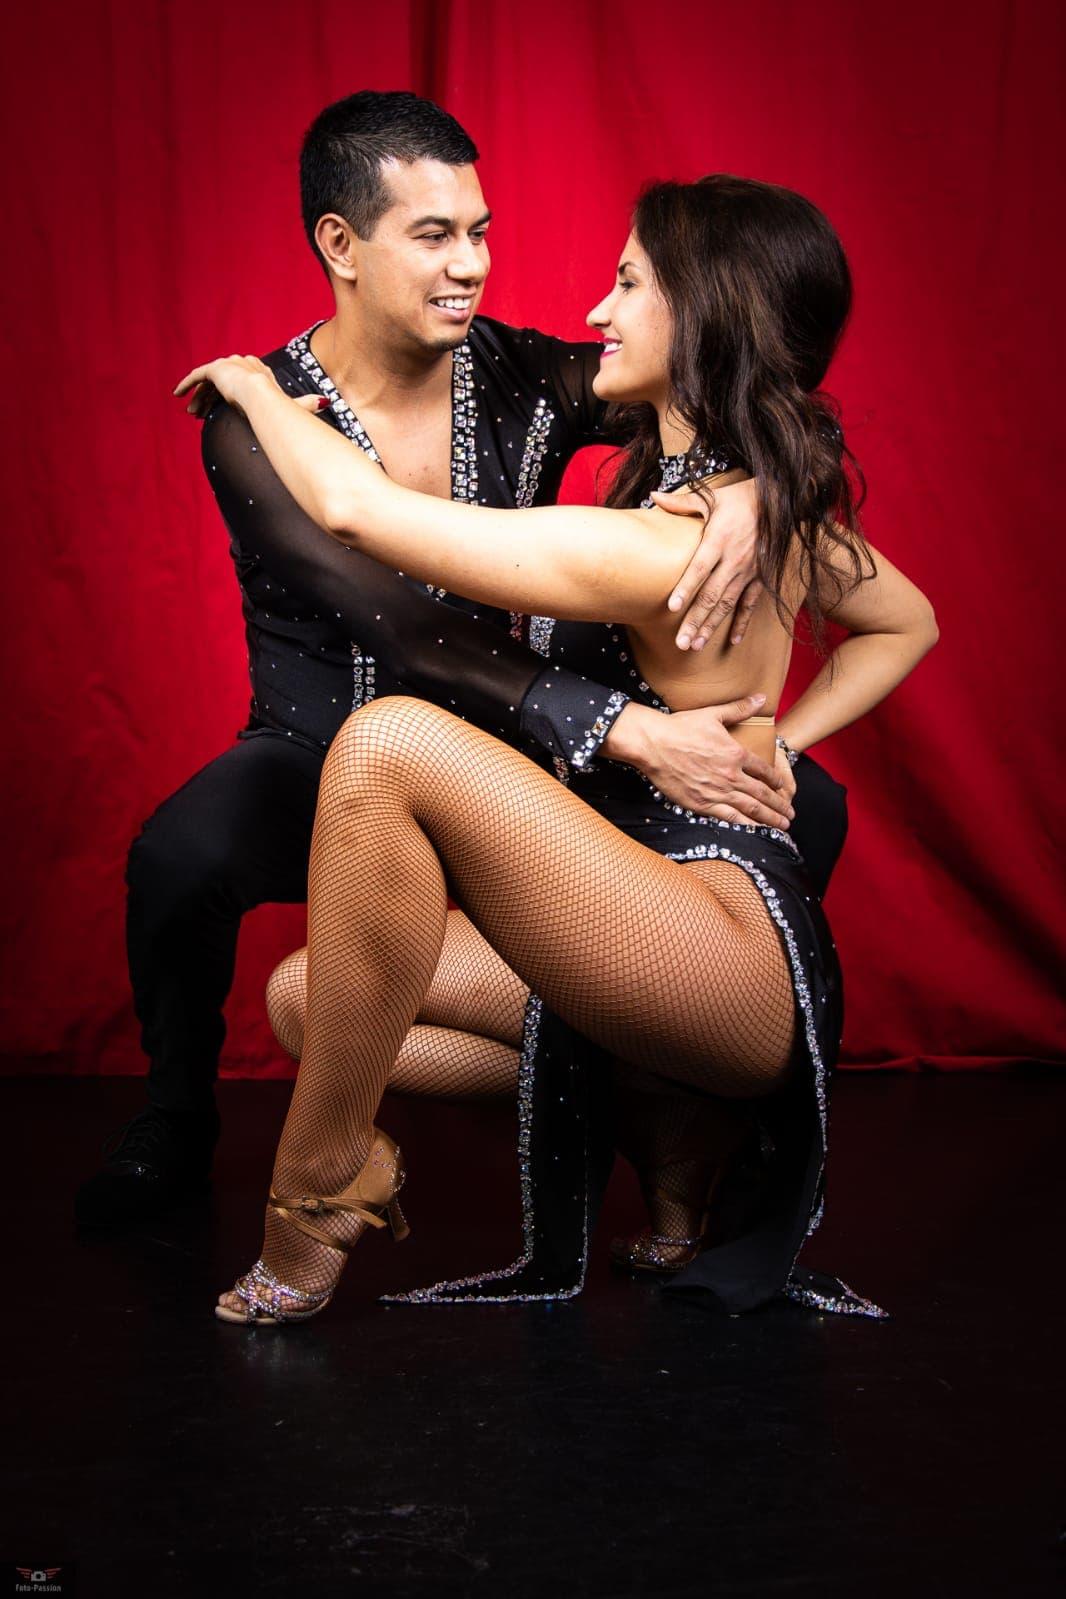 Juan Carlos & Coralie